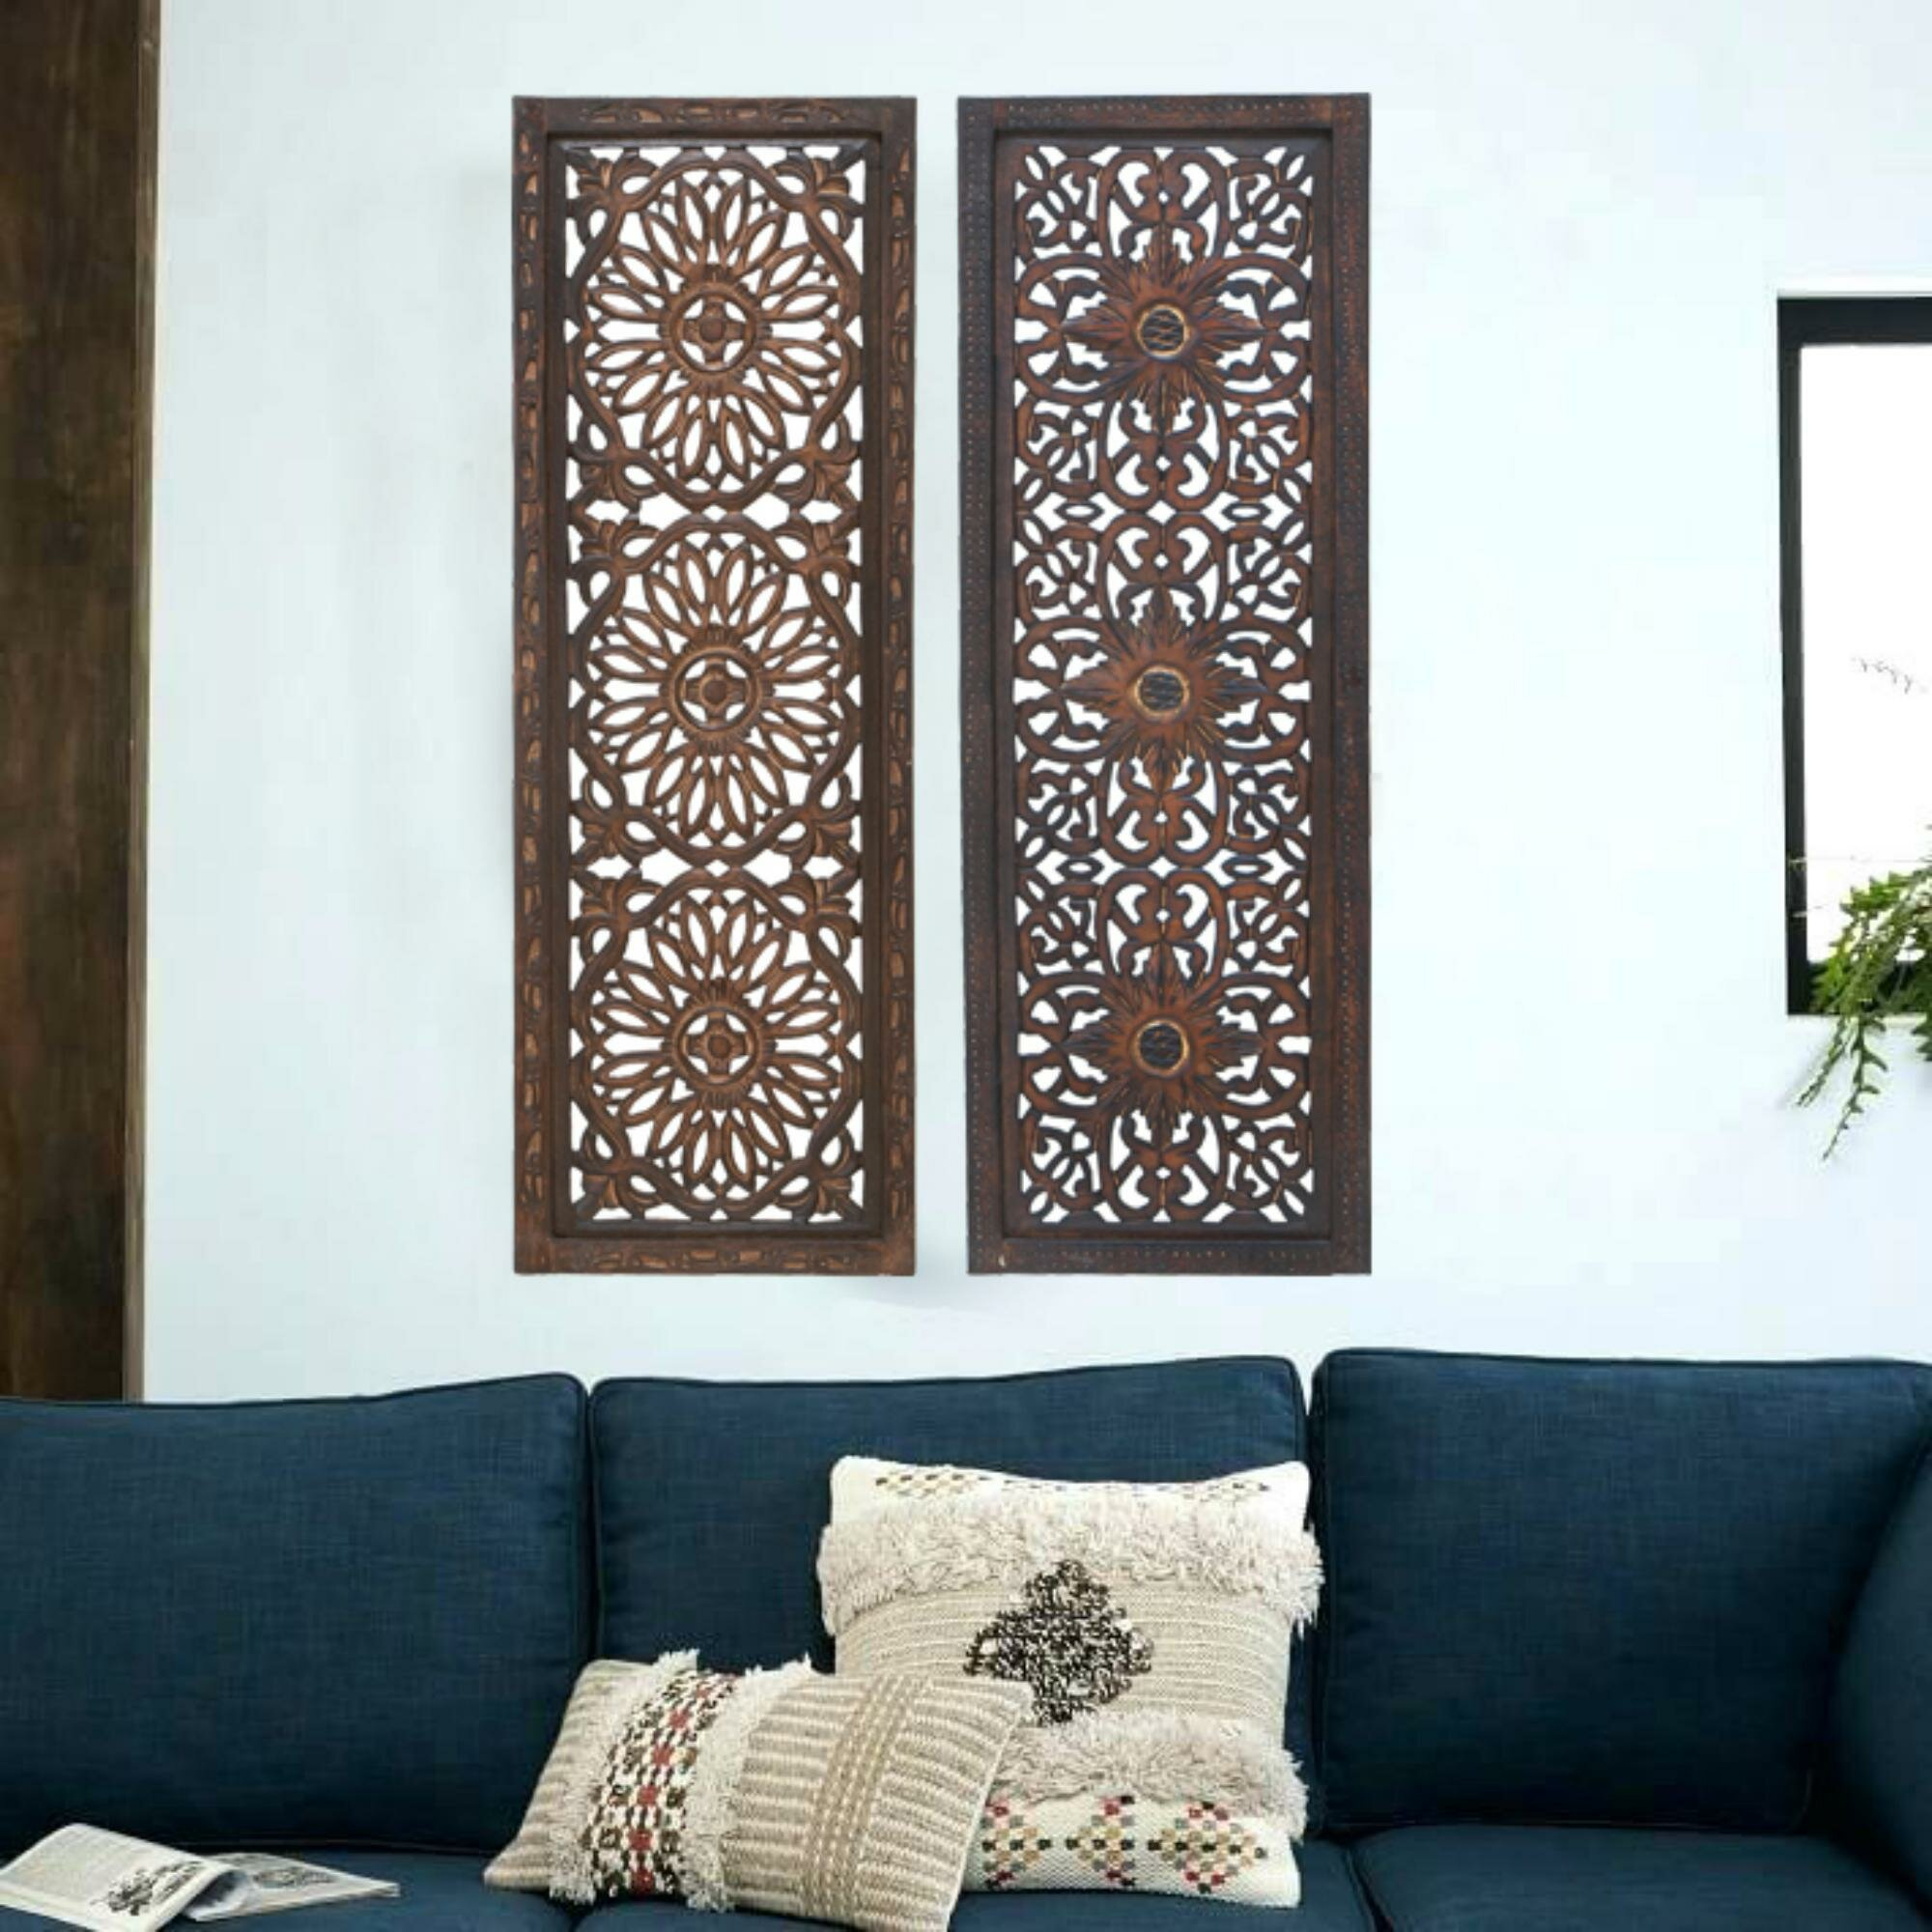 2 Piece Panel Wood Wall Decor Set